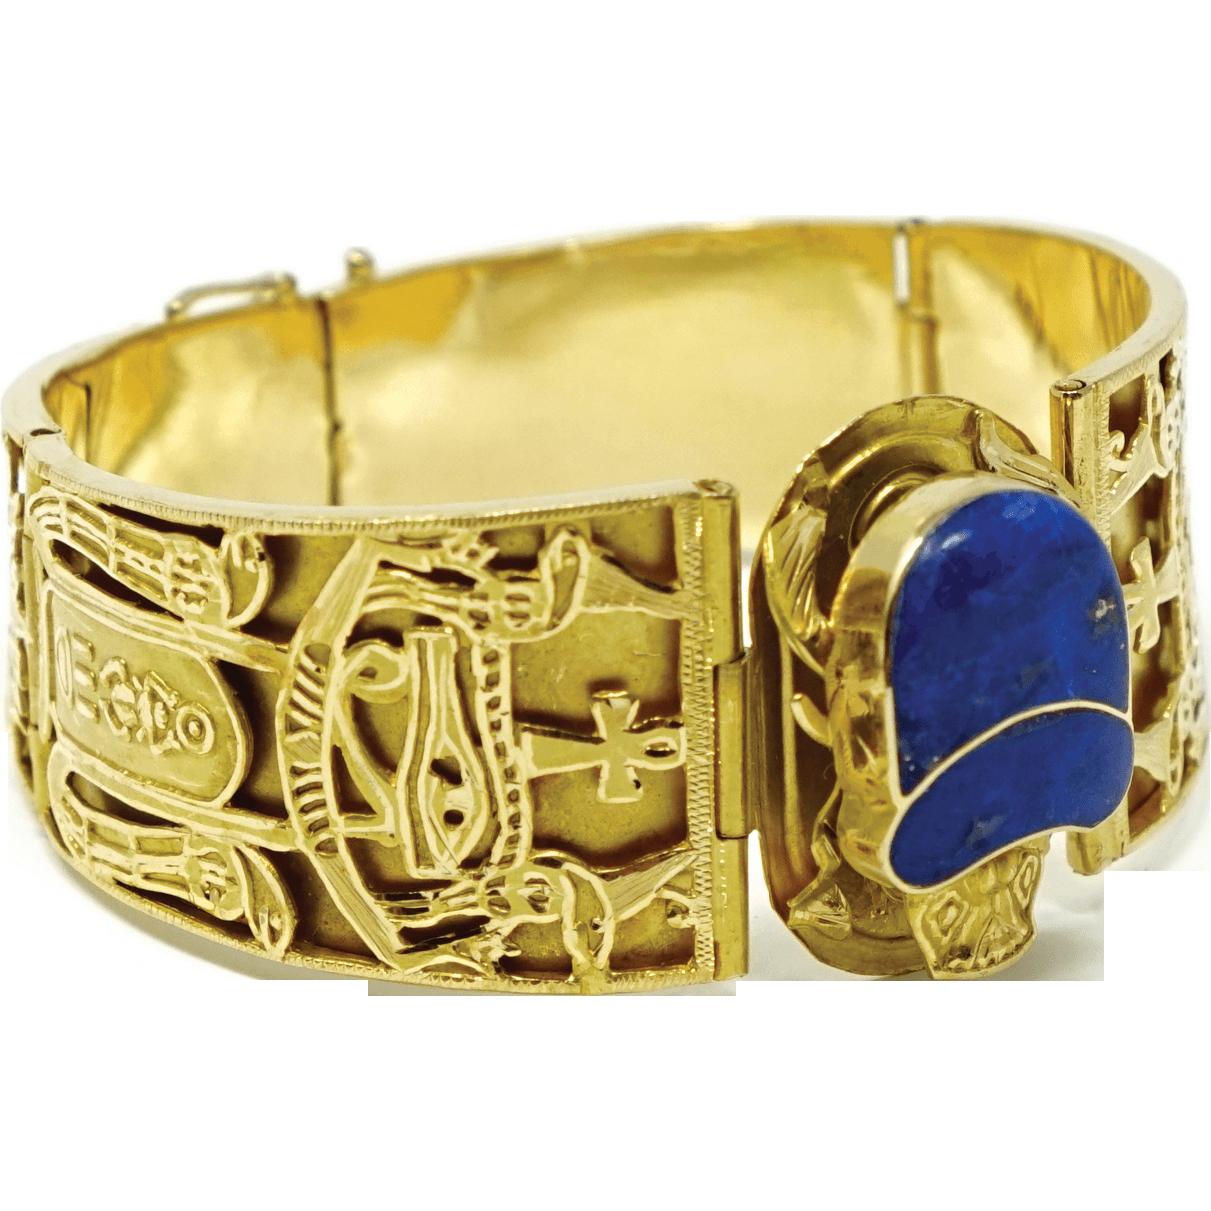 Vintage Egyptian Revival 18k Gold Lapis Lazuli Scarab Bracelet